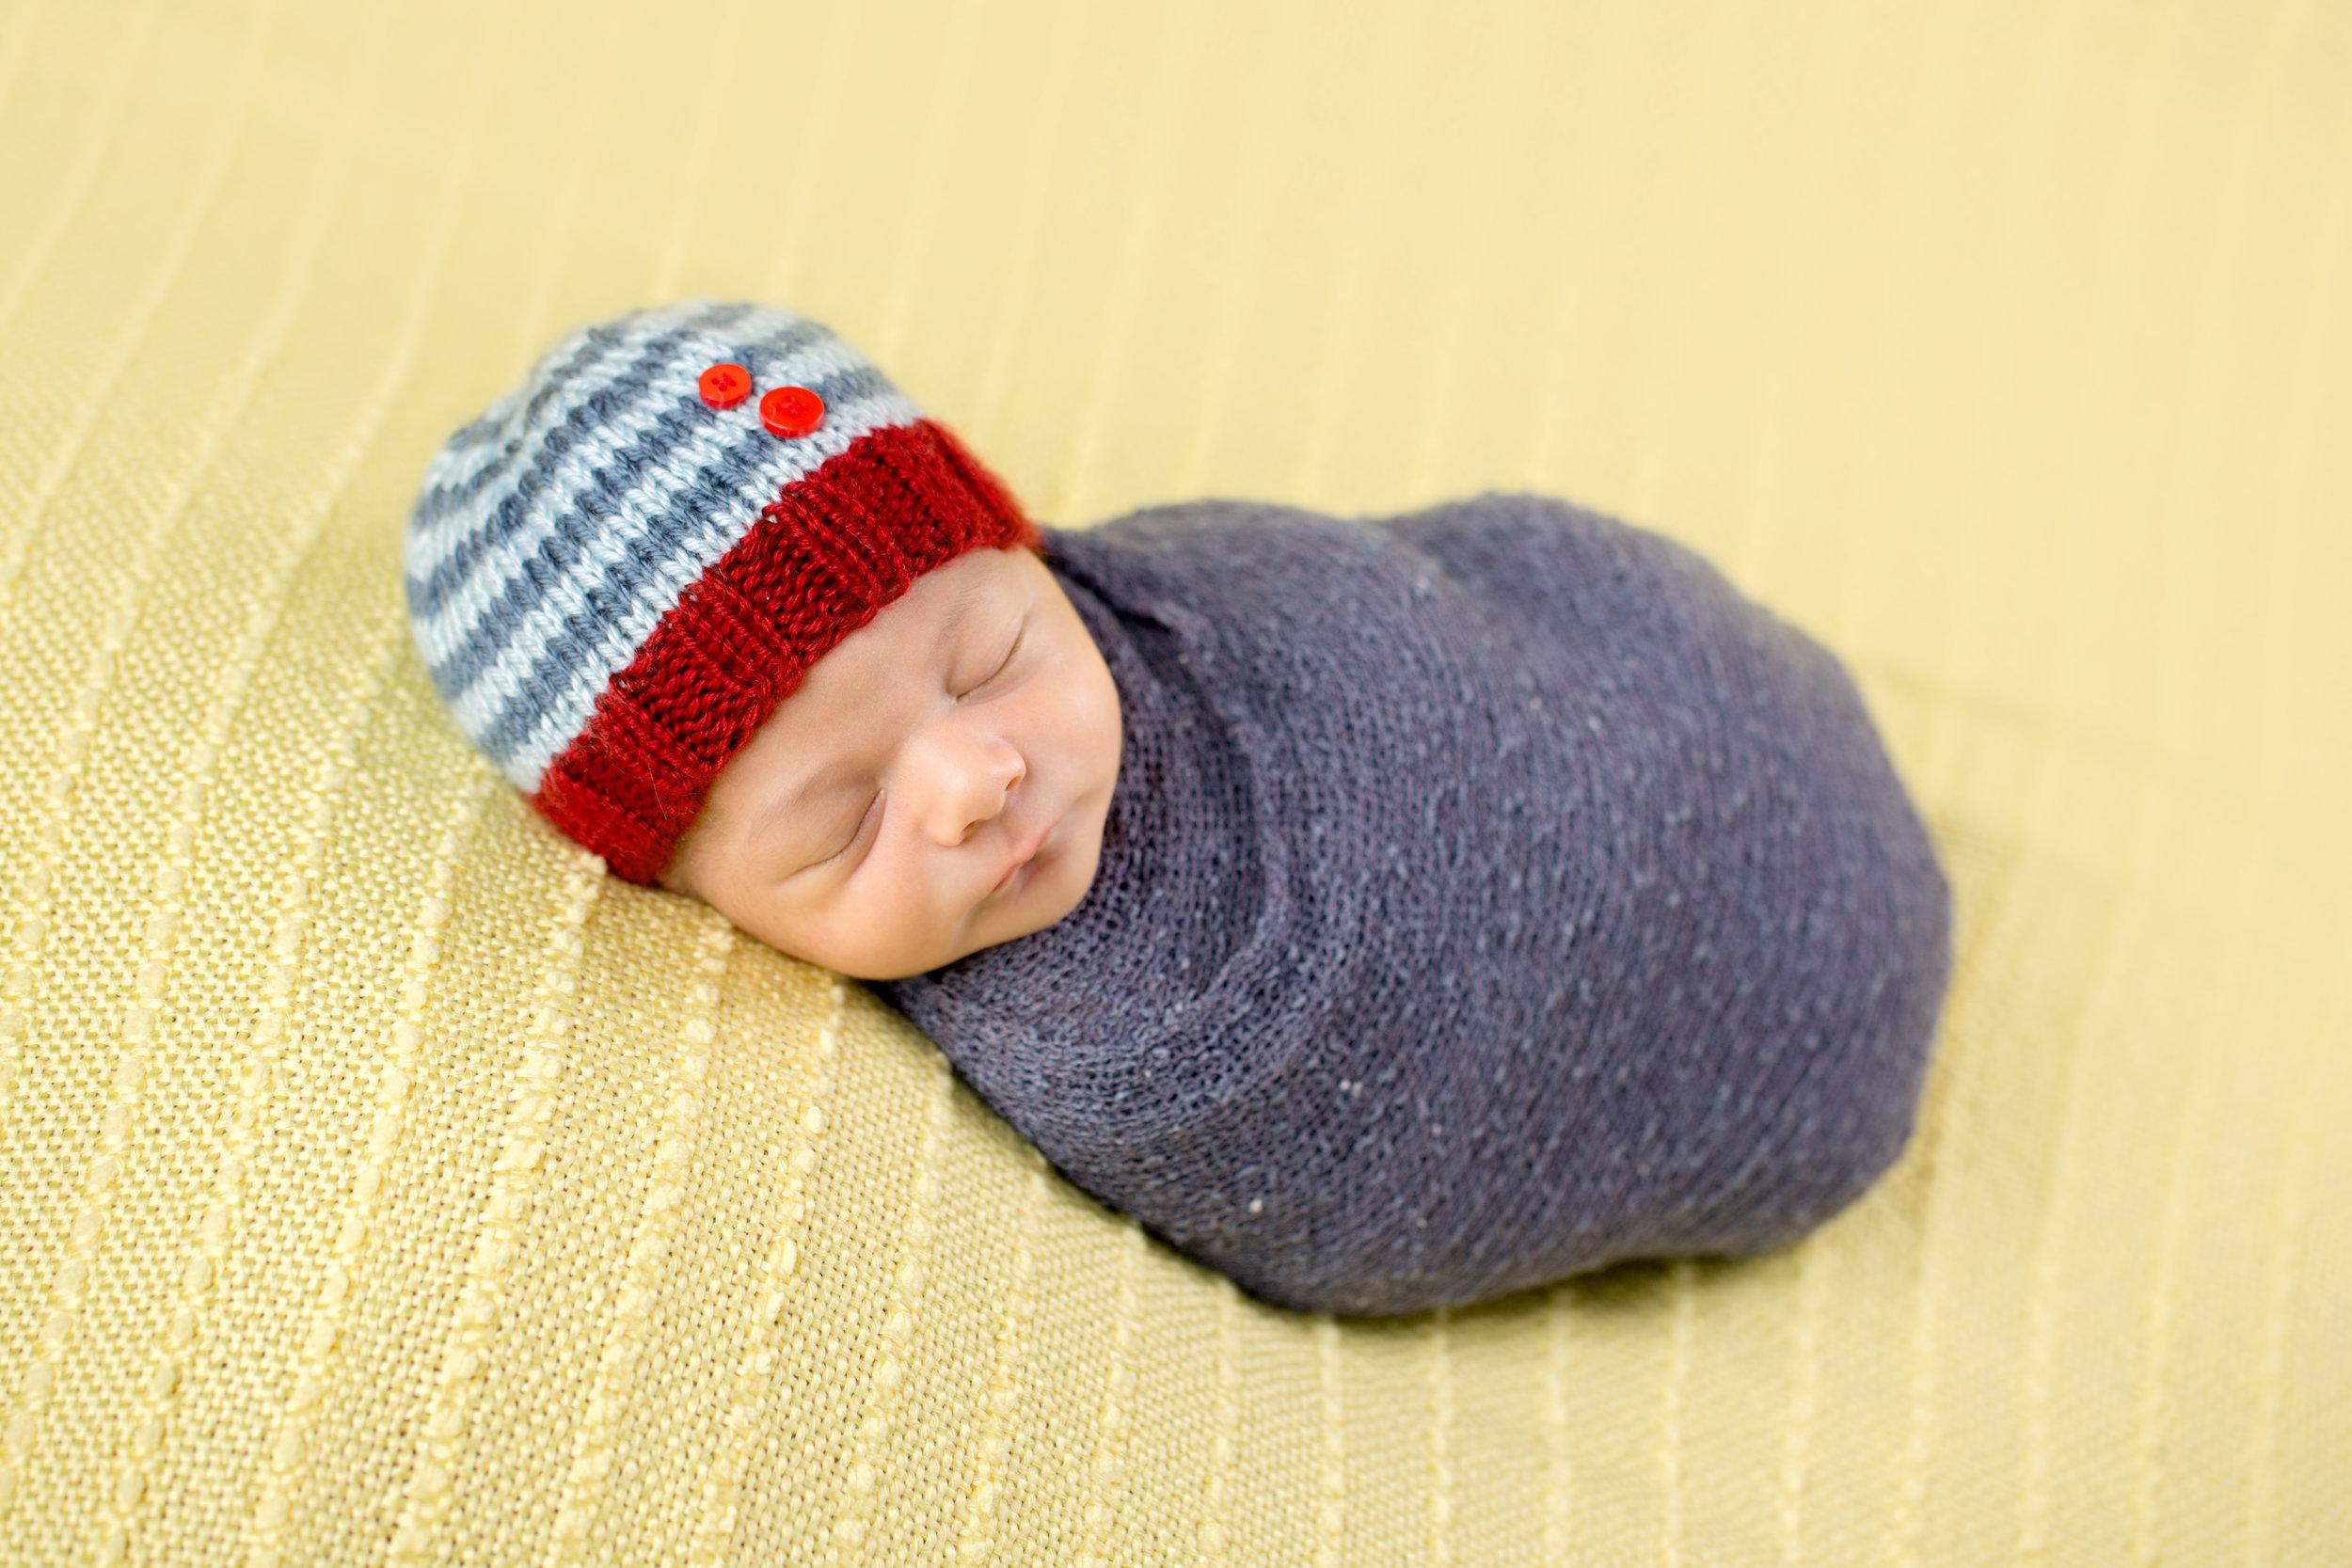 NEWBORN PHOTOGRPAHY | Solar System Themed Nursery, Colorful Newborn Photos